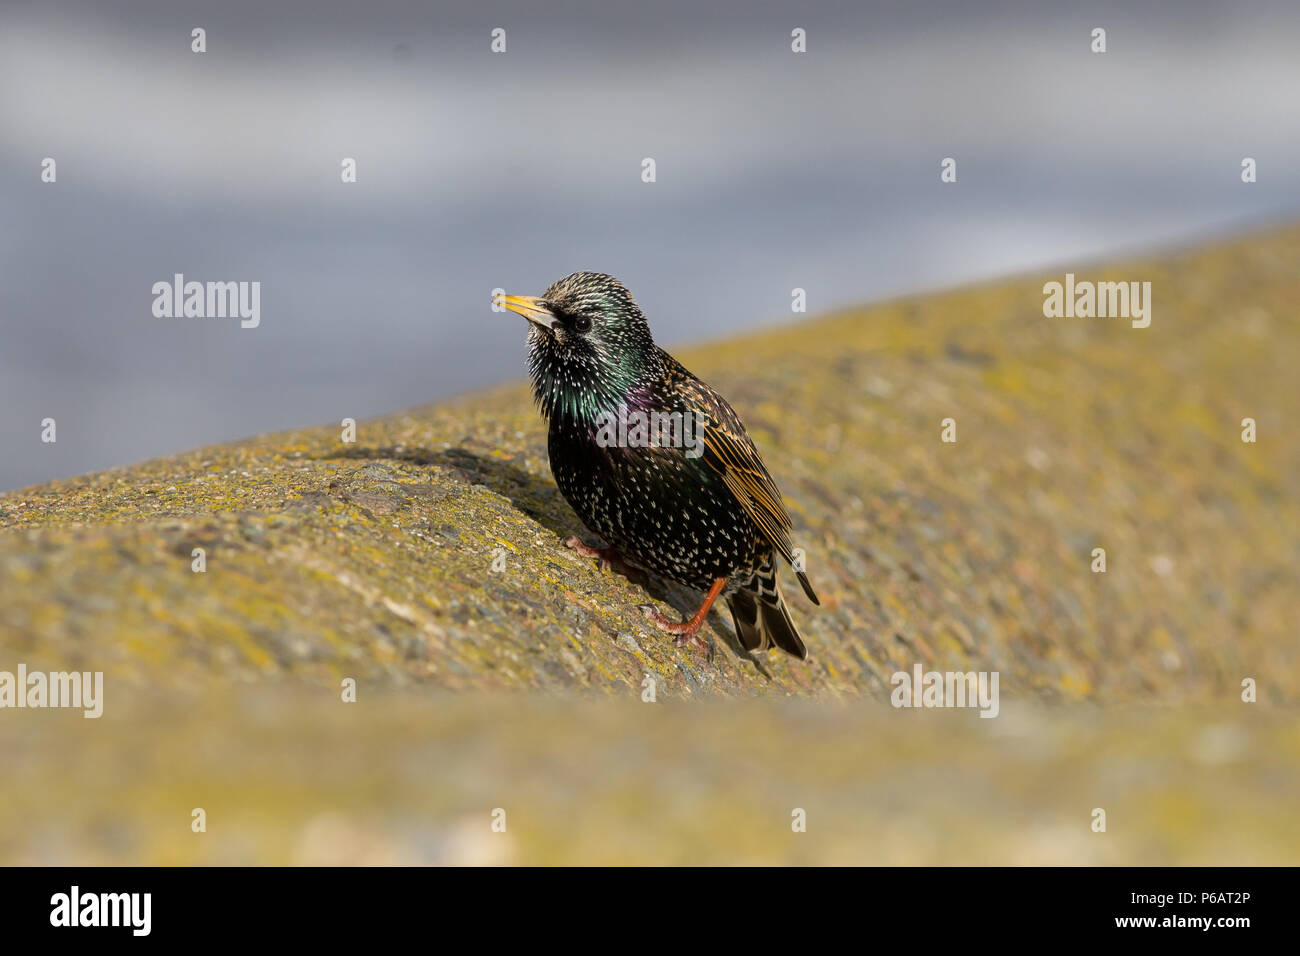 Single Adult Starling, Sturnus vulgaris, UK Stock Photo